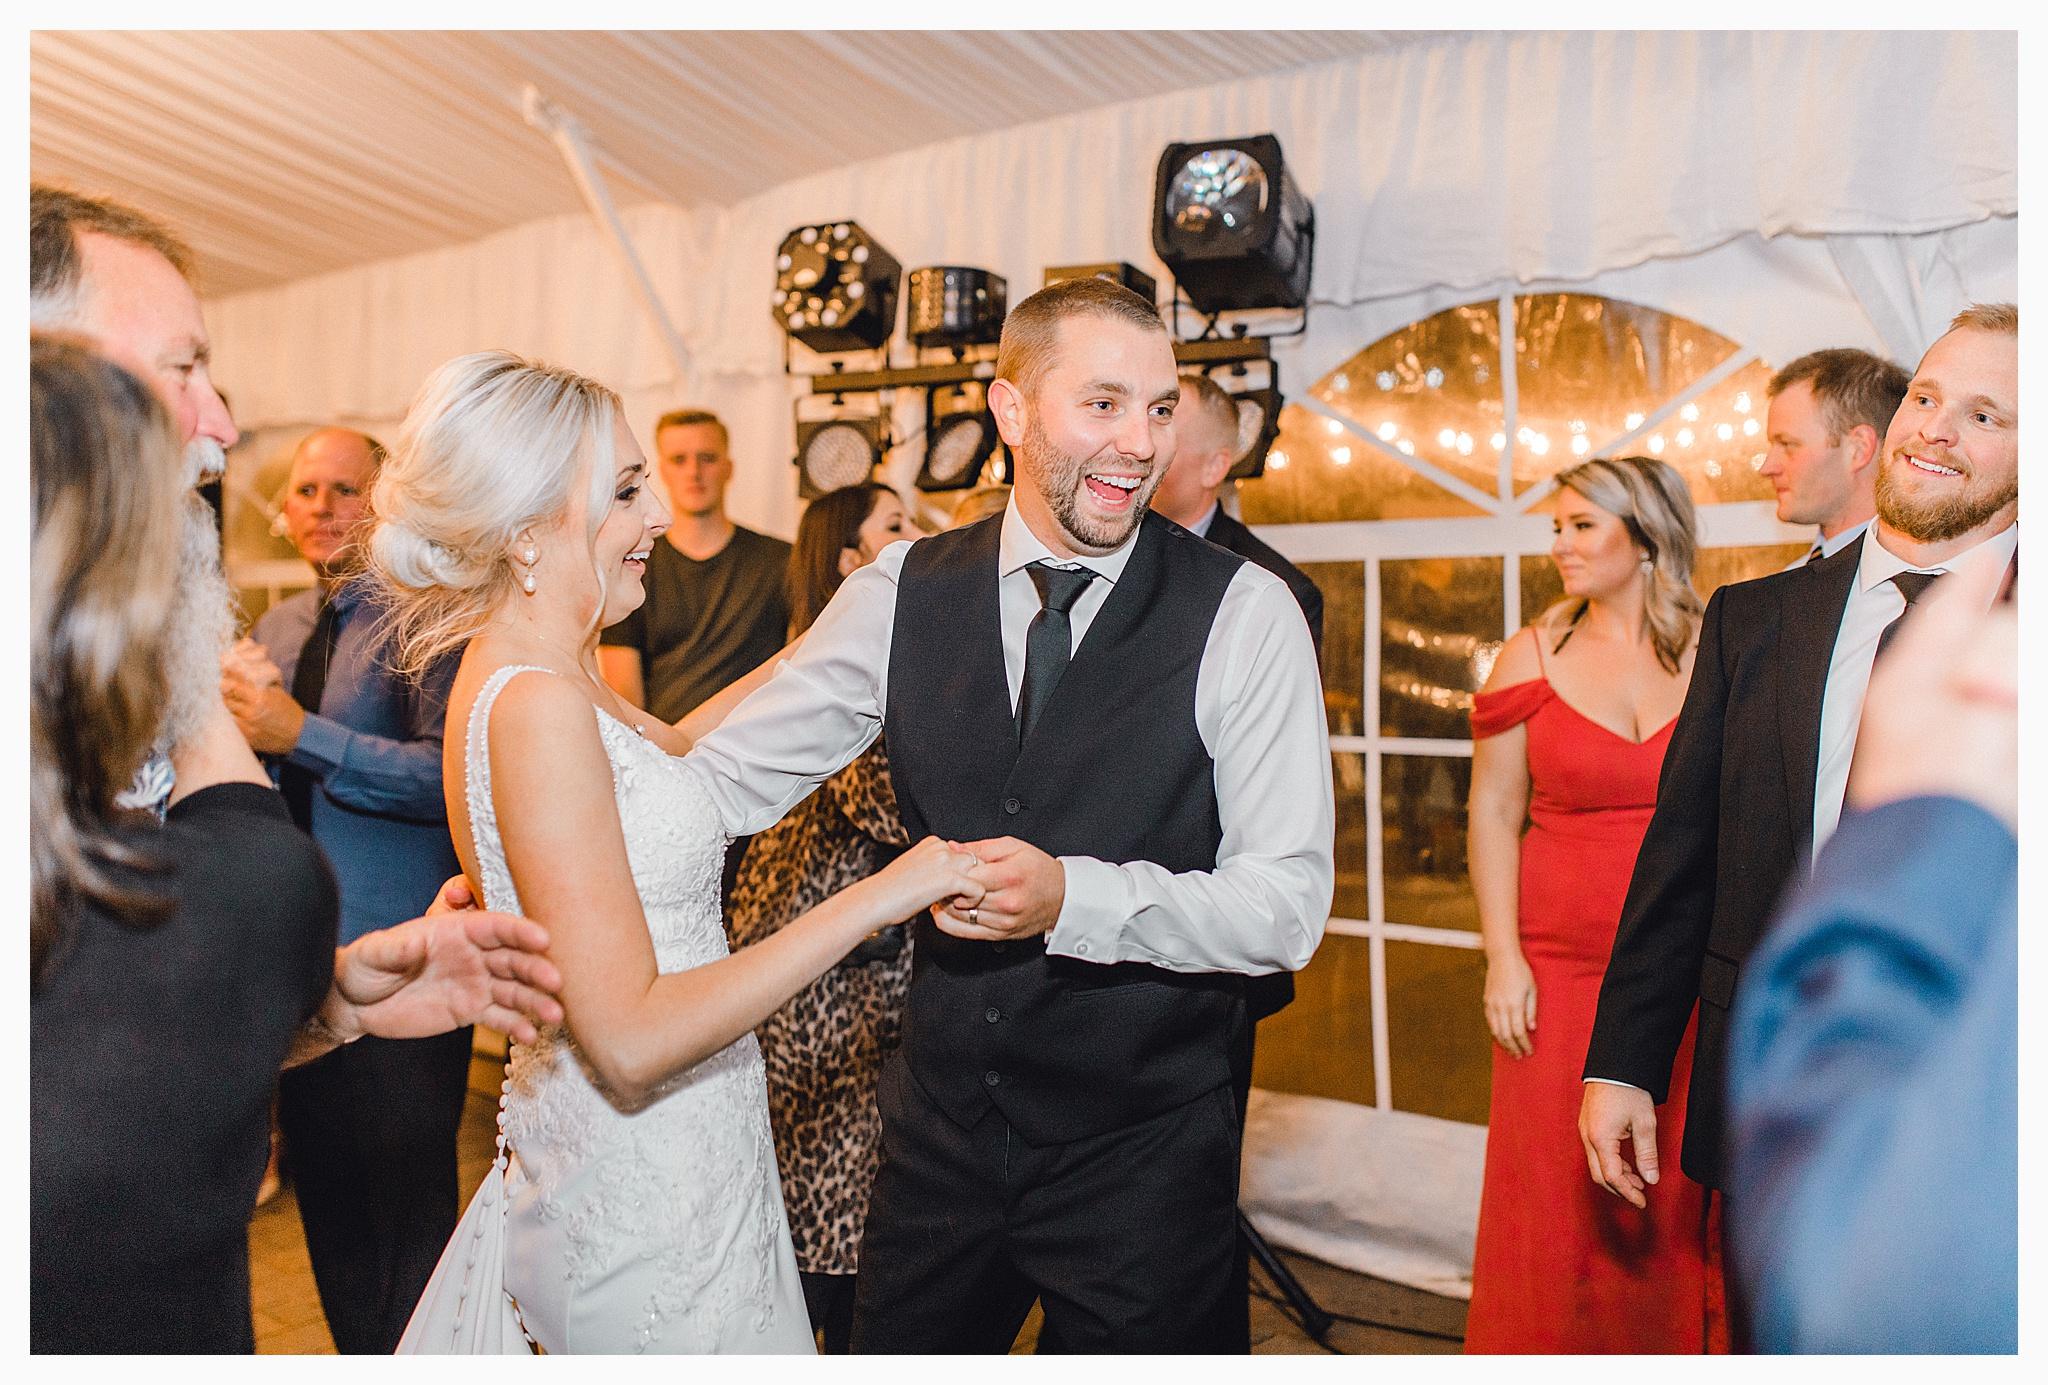 Emma Rose Company Light and Airy Wedding Photographer, Beautiful fall wedding at Rock Creek Gardens Venue in Puyallup, Washington._0110.jpg